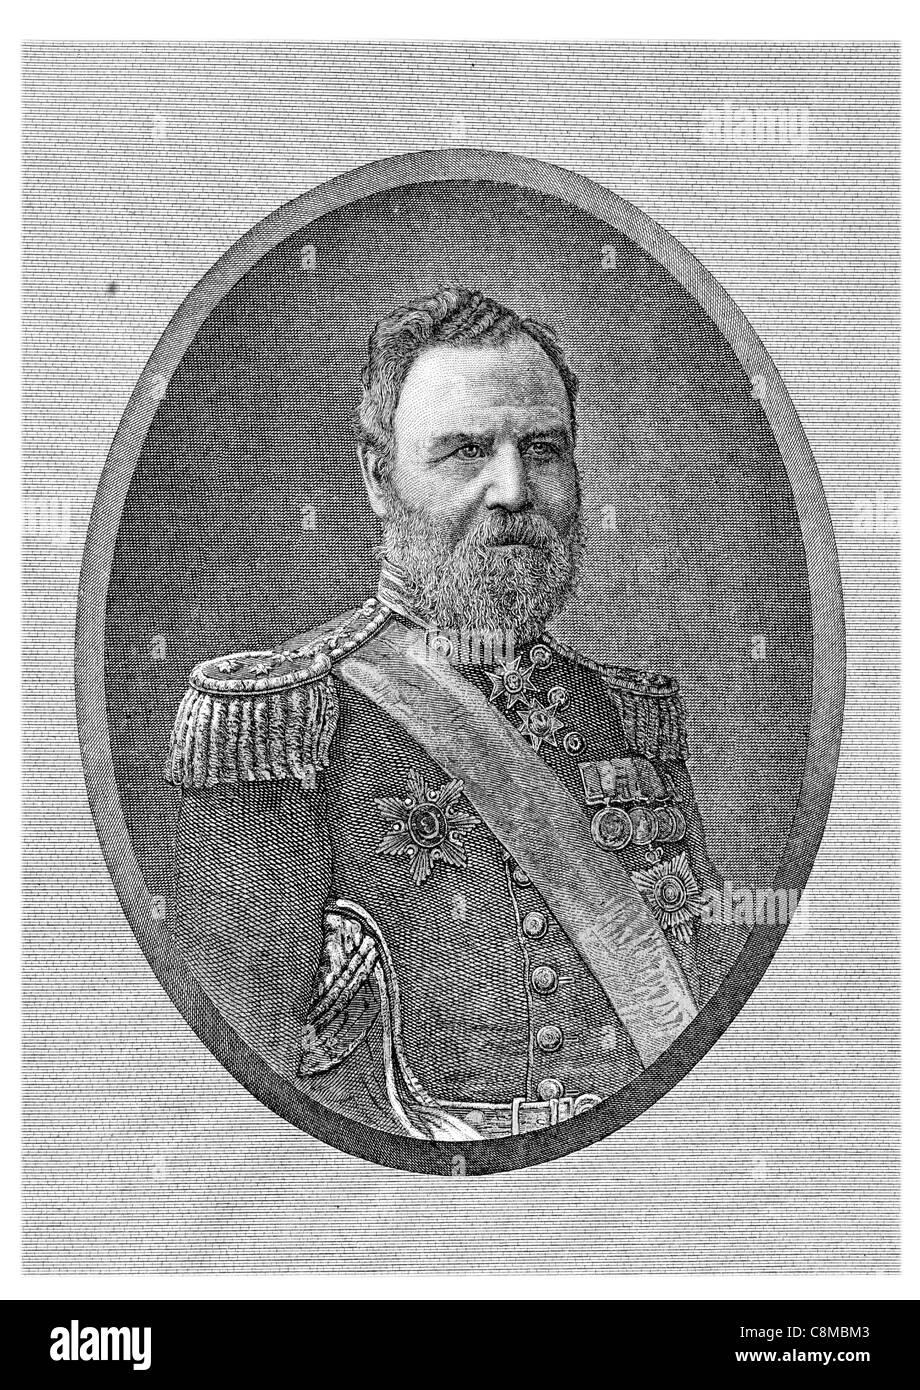 Almirante Frederick Beauchamp Paget Seymour, 1er Barón Alcester 1821 1895 British naval Comandante en Jefe de la flota del canal Foto de stock